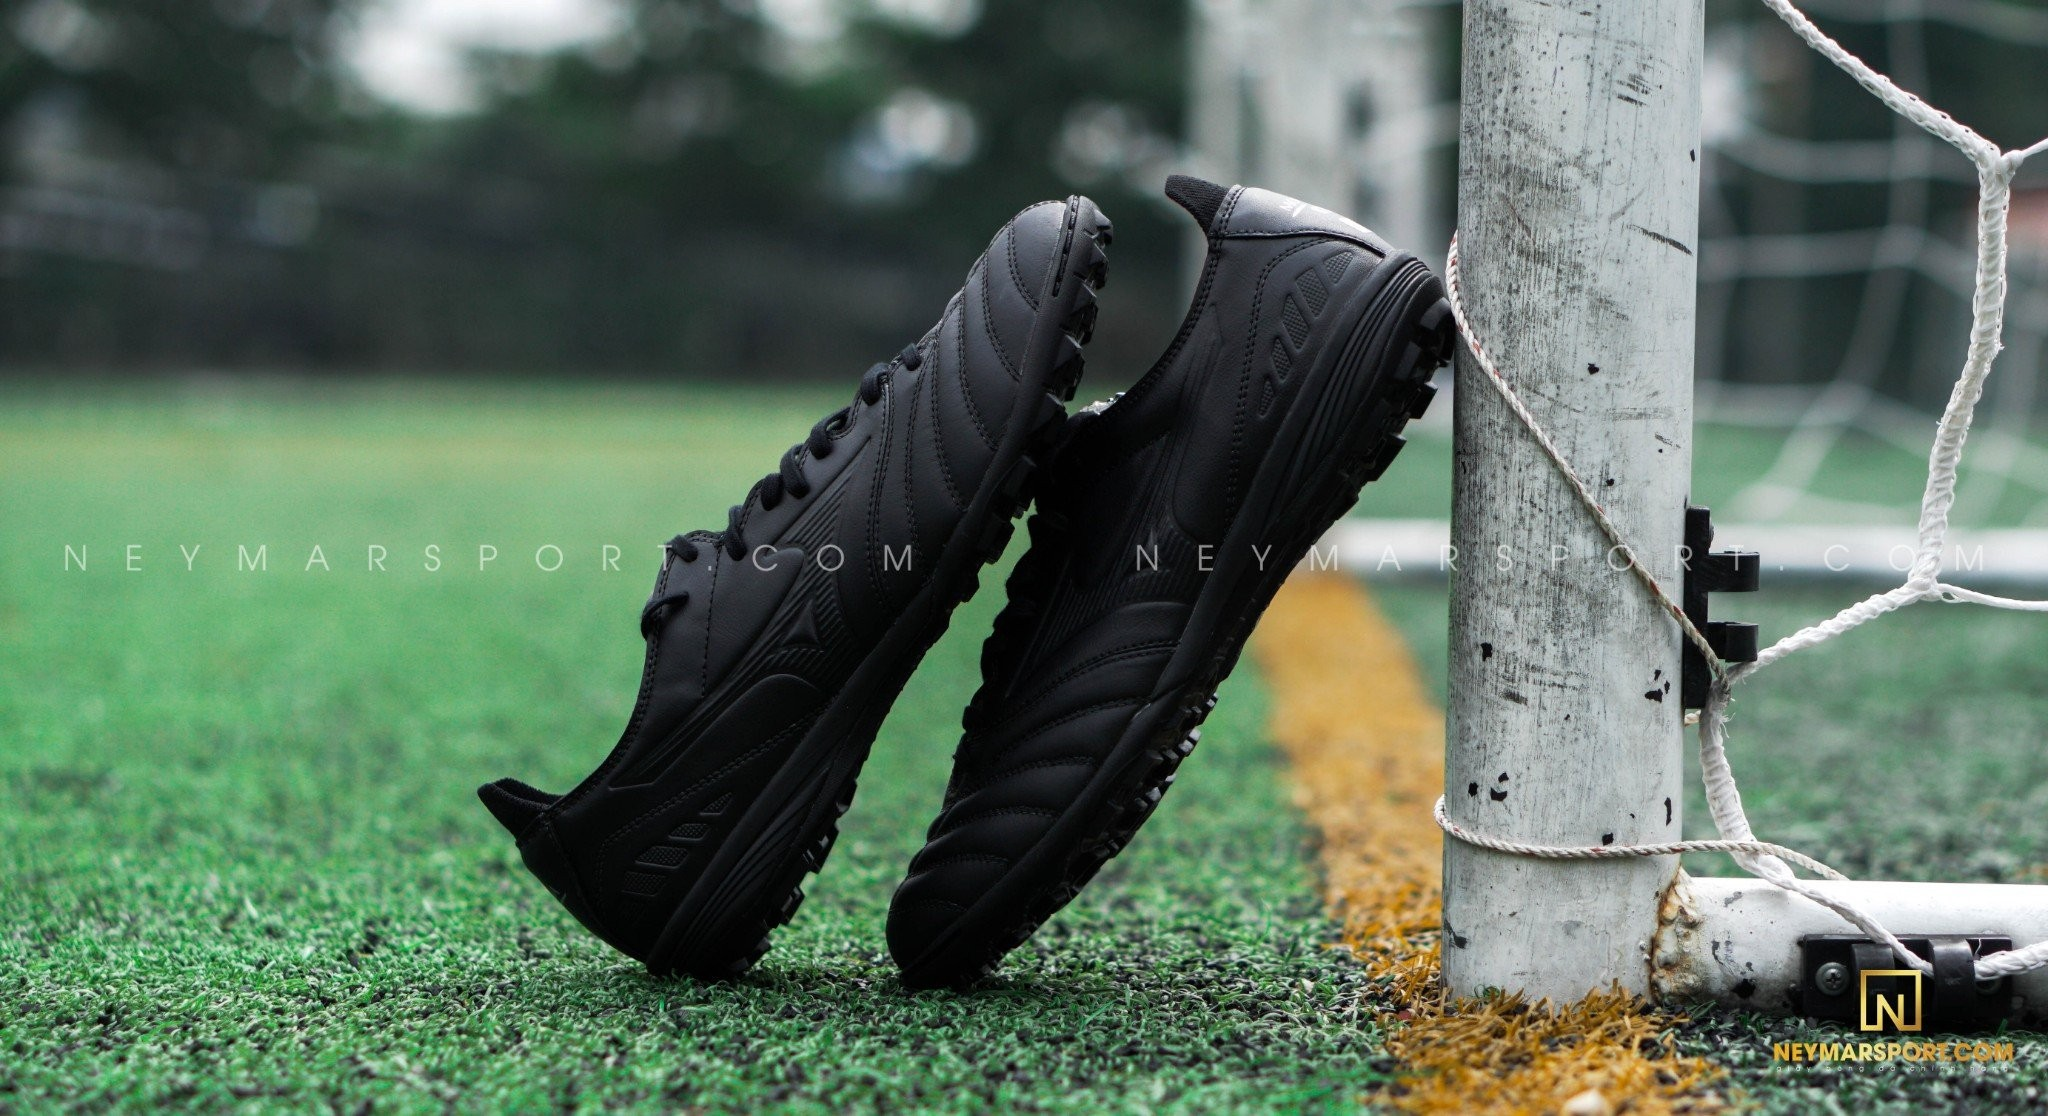 Giày đá bóng Mizuno Morelia Neo III Pro AS TF Reborn Revolution - Black/Black